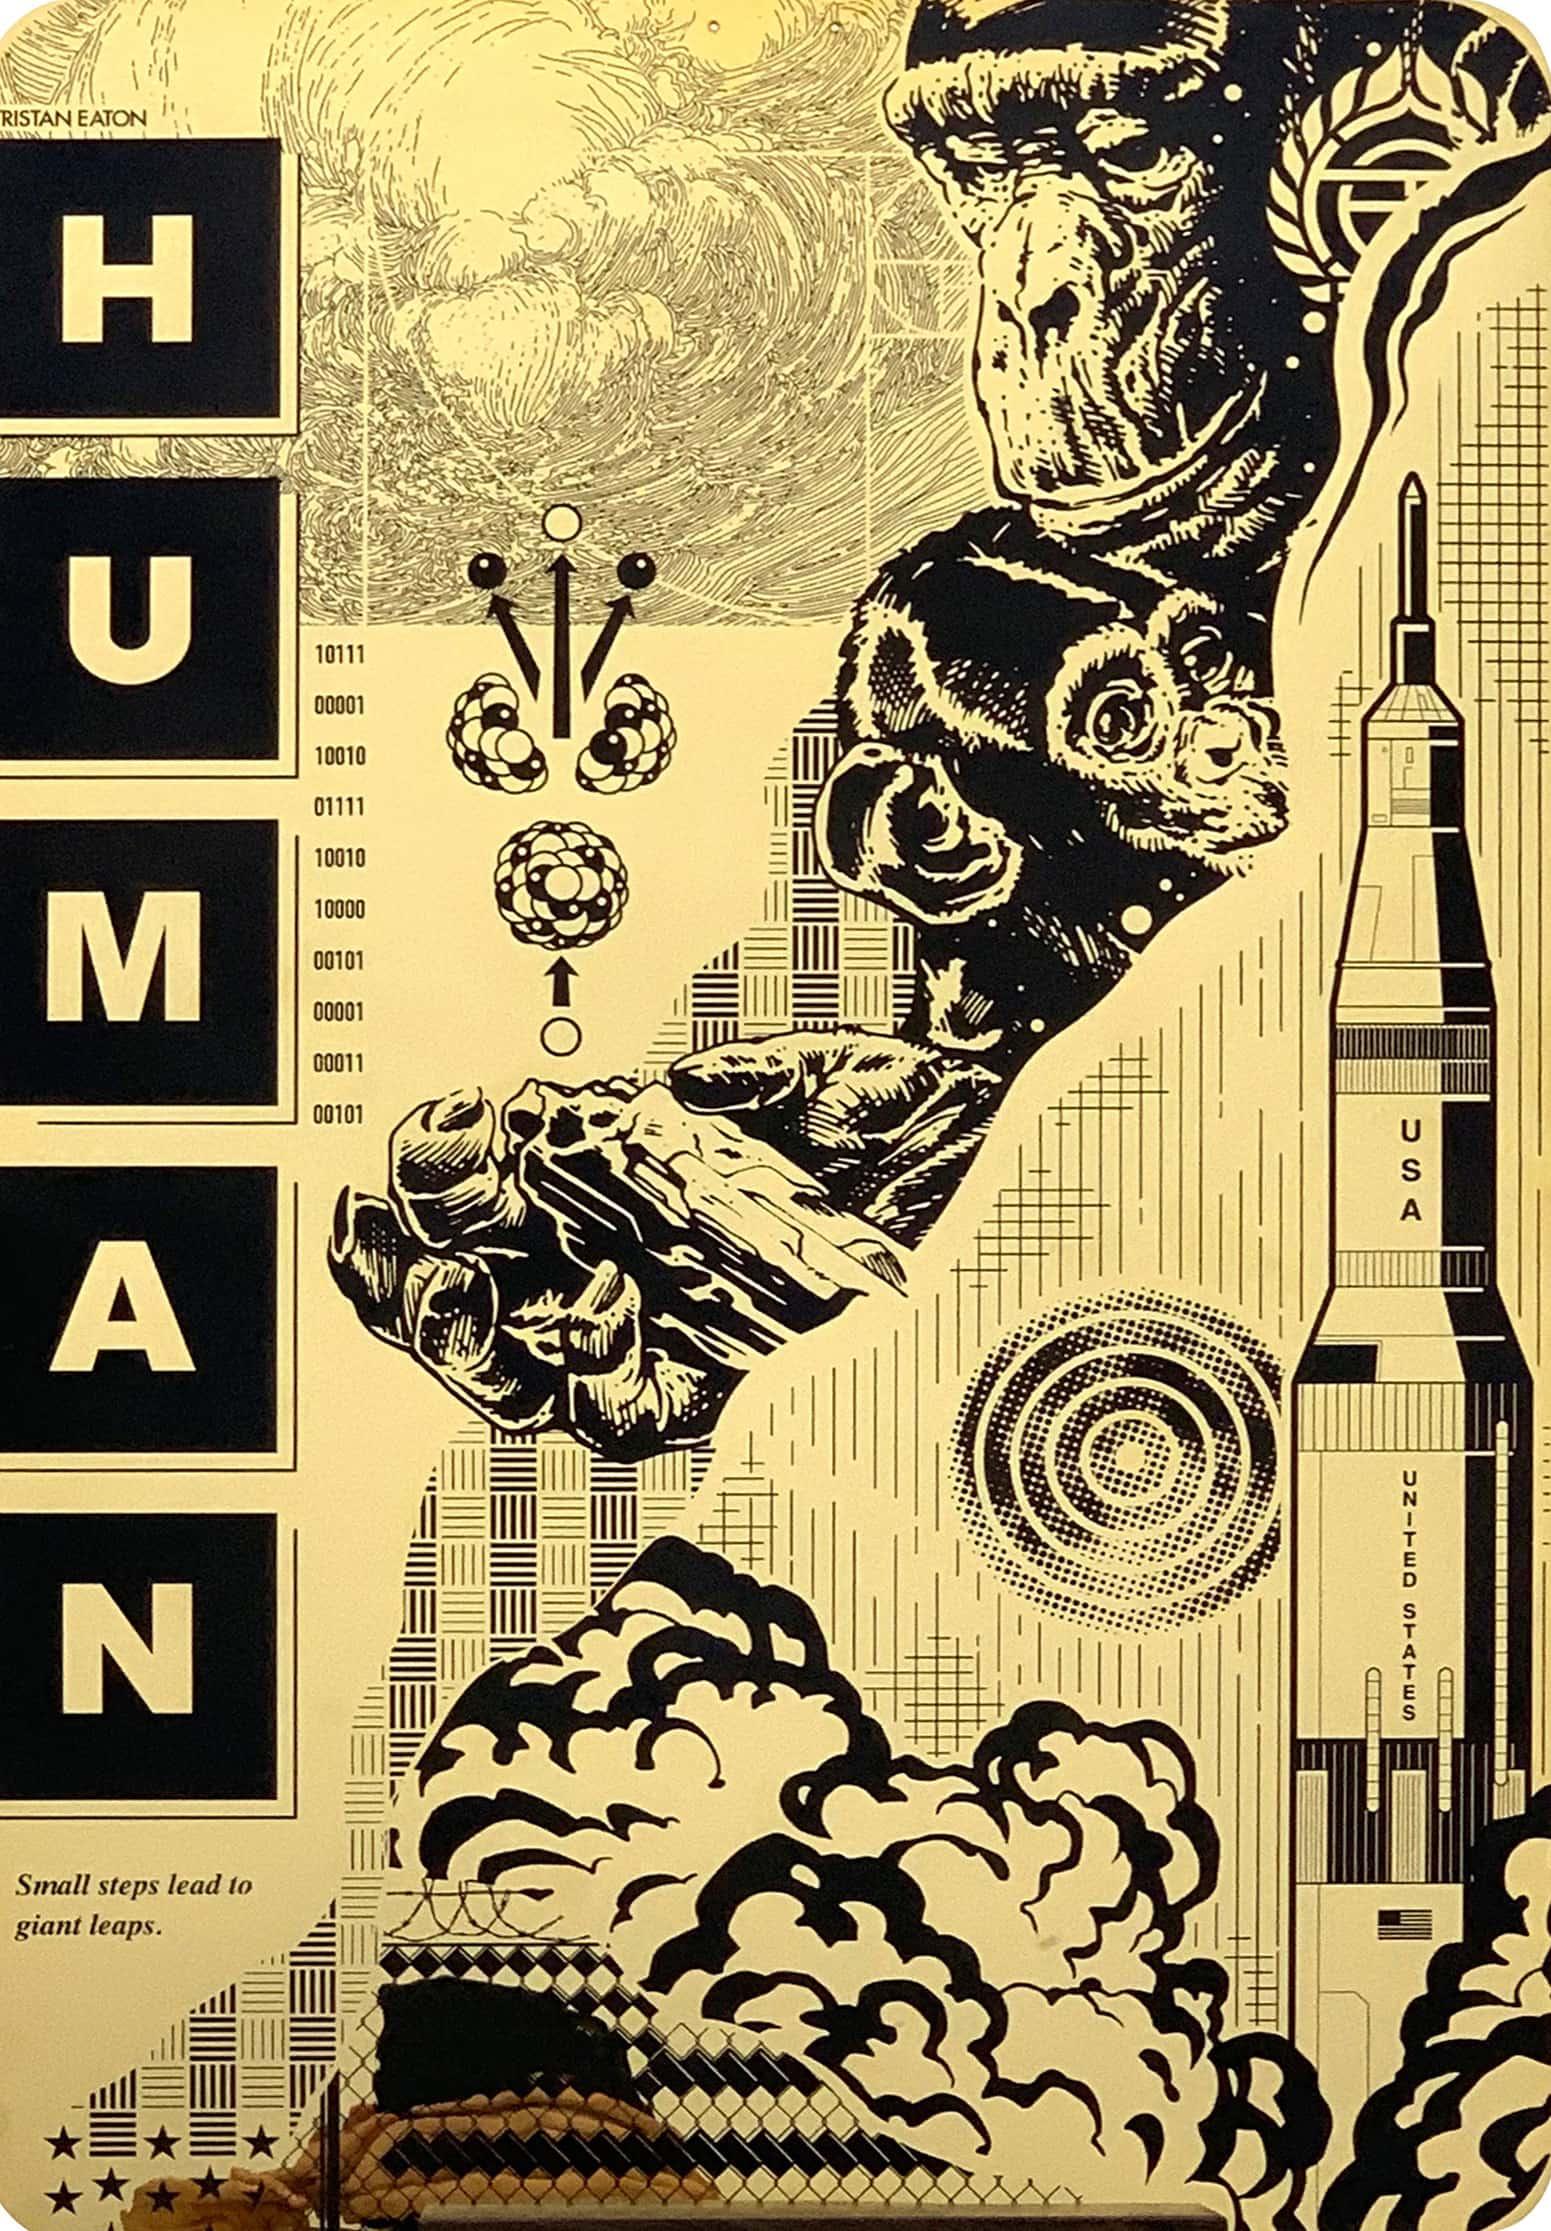 Human Kind by Tristan Eaton